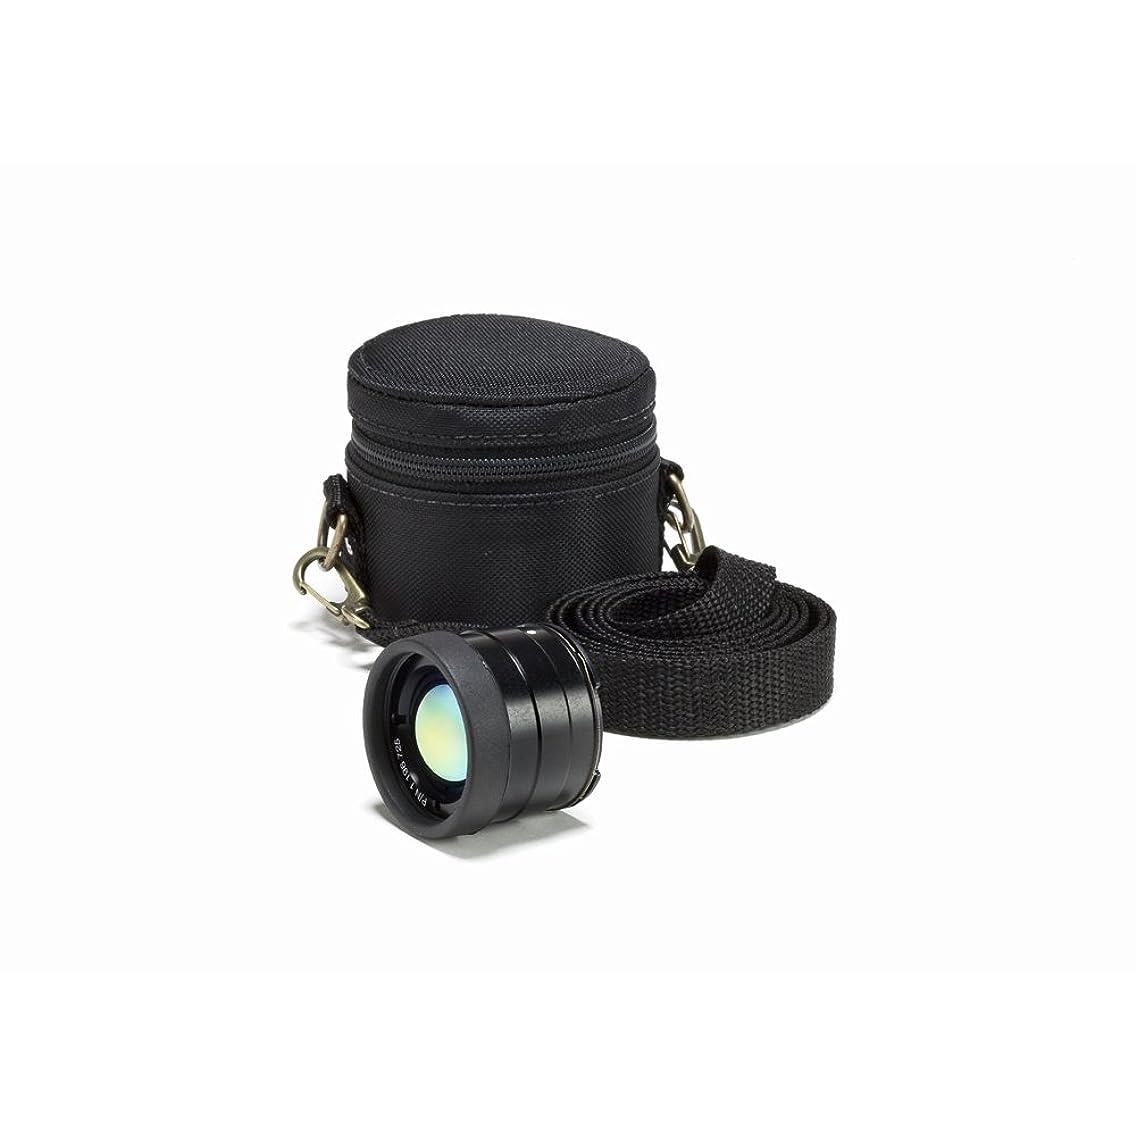 45-Degree Lens with Case for E40, E50, E60, T420, T440, T460